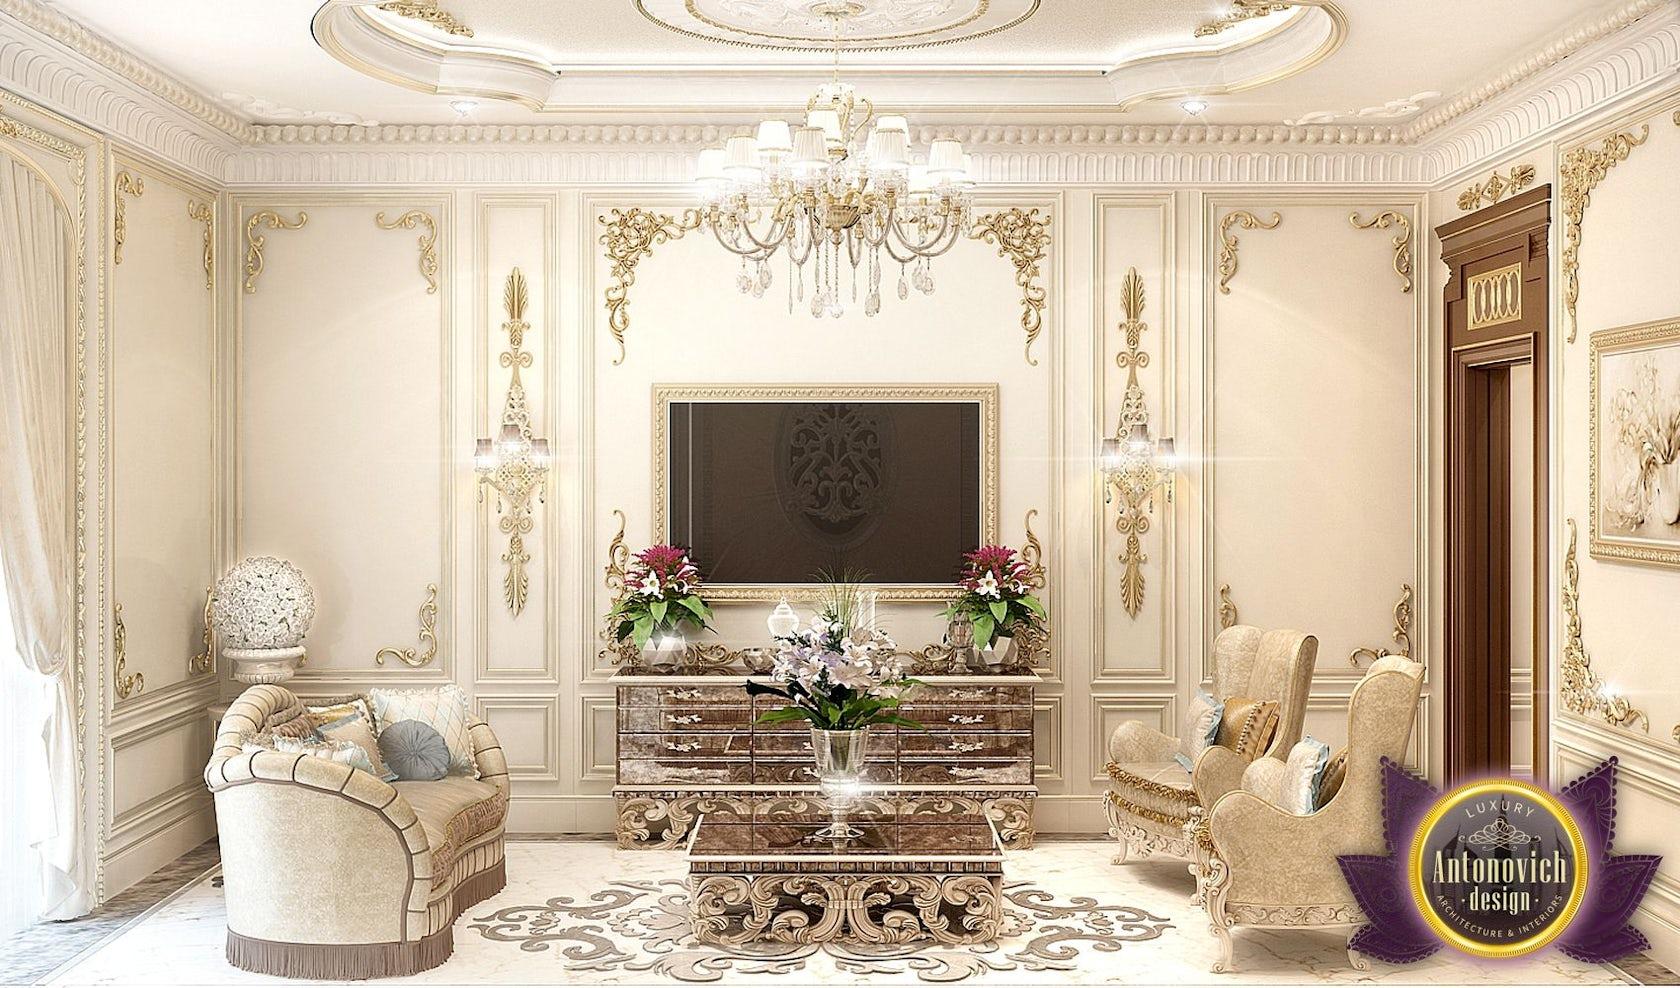 luxury royal arabic master bedroom of luxury antonovich design architizer. Black Bedroom Furniture Sets. Home Design Ideas